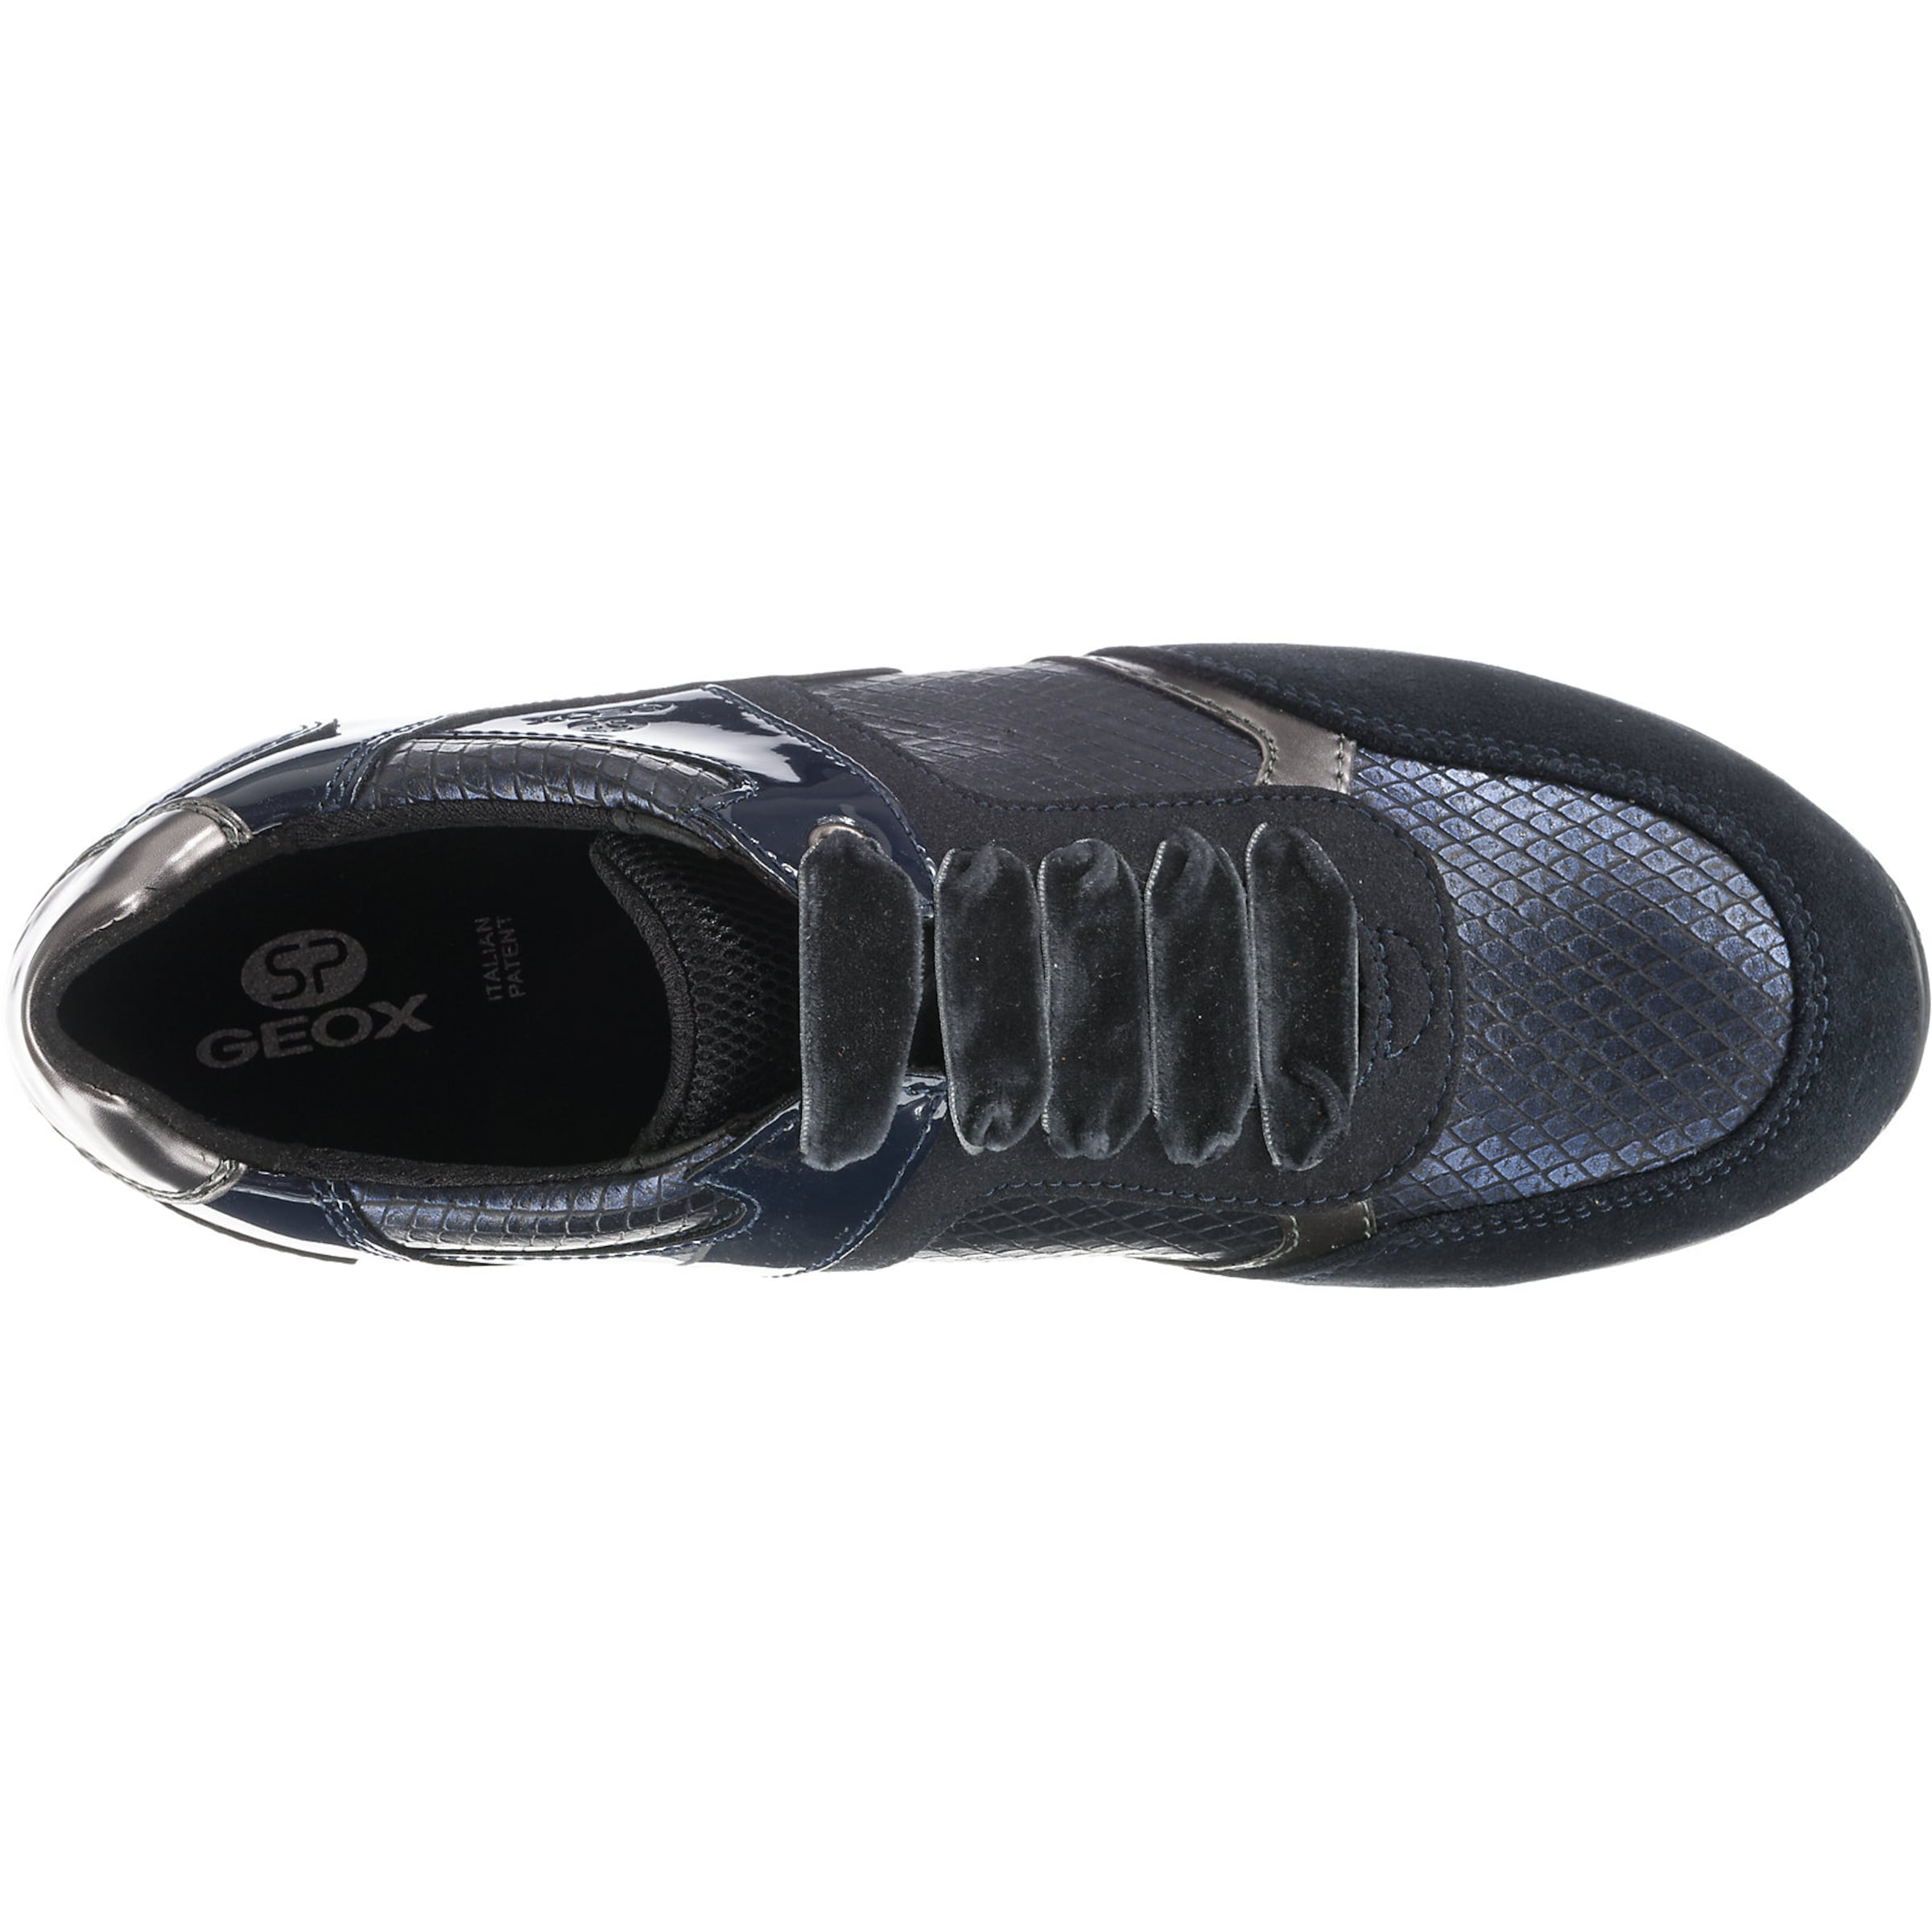 'deynna' In 'deynna' Geox Navy In 'deynna' Sneakers Geox Sneakers In Navy Sneakers Geox qpSGMVzU